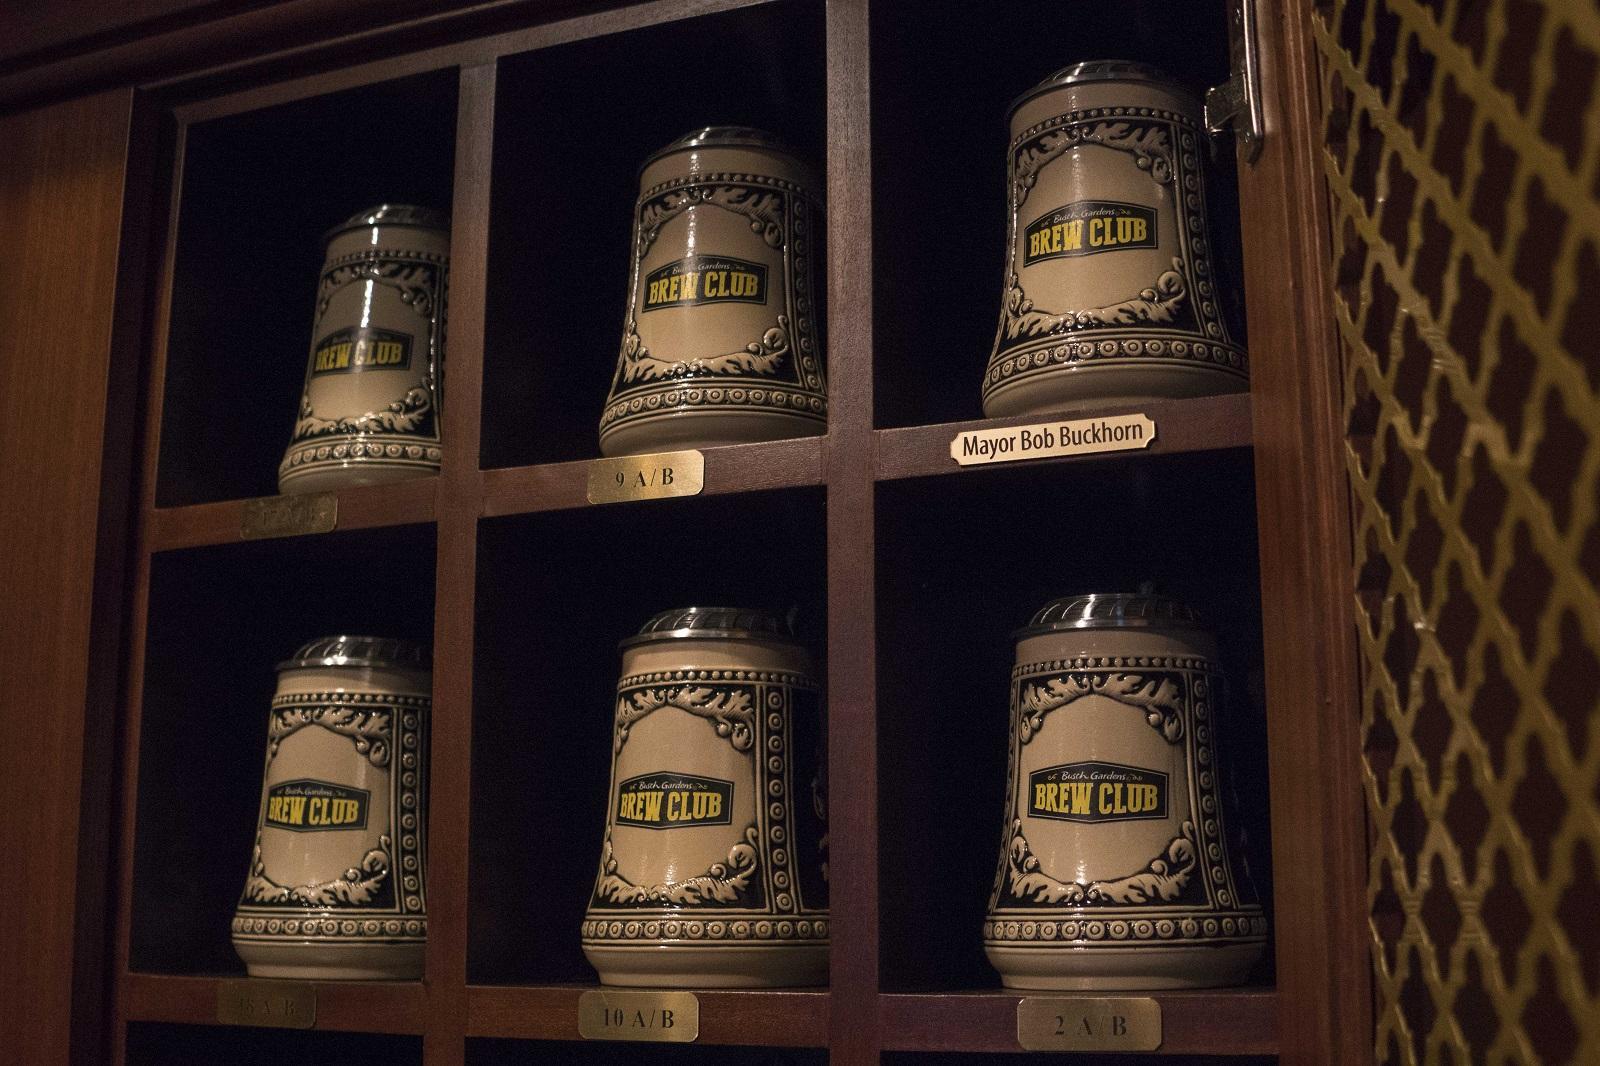 Busch Gardens Brings Back Free Beer Samples | WUSF News